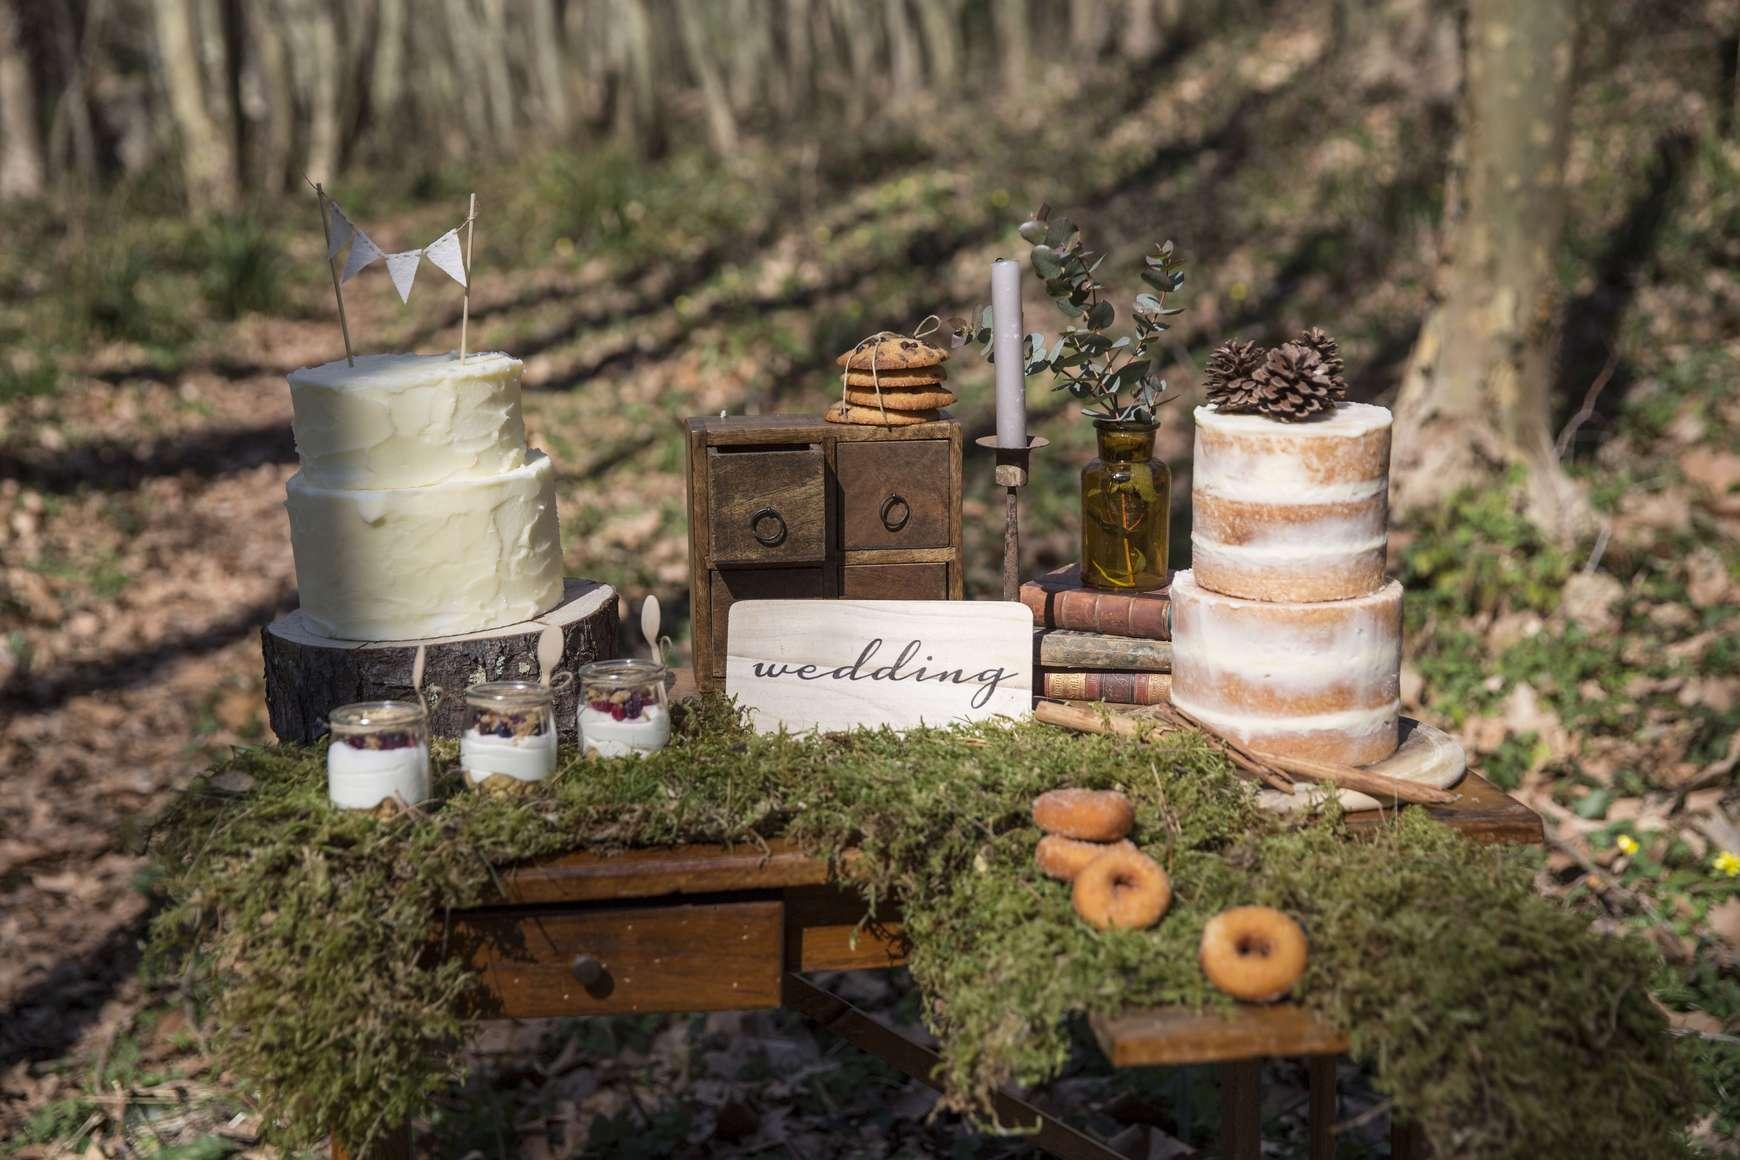 Outdoor ivory wedding photo session decor